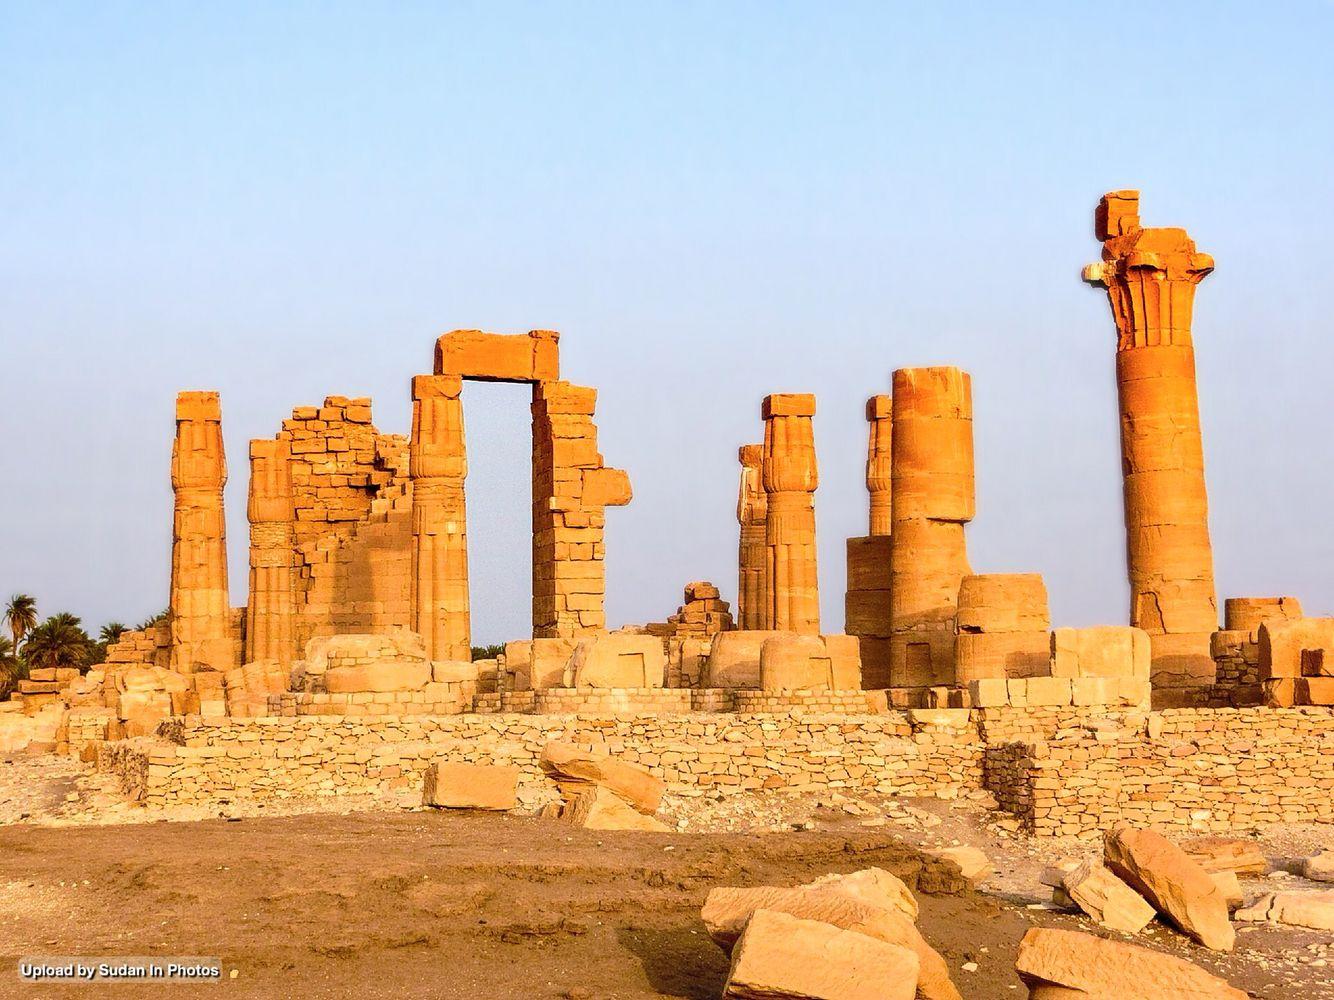 Sudan Antiquities Soleb Temple Northern Sudan من آثار السودان سولب شمال السودان By Ben Tang Sudan Soleb Antiquities Temple Northern Archeologia